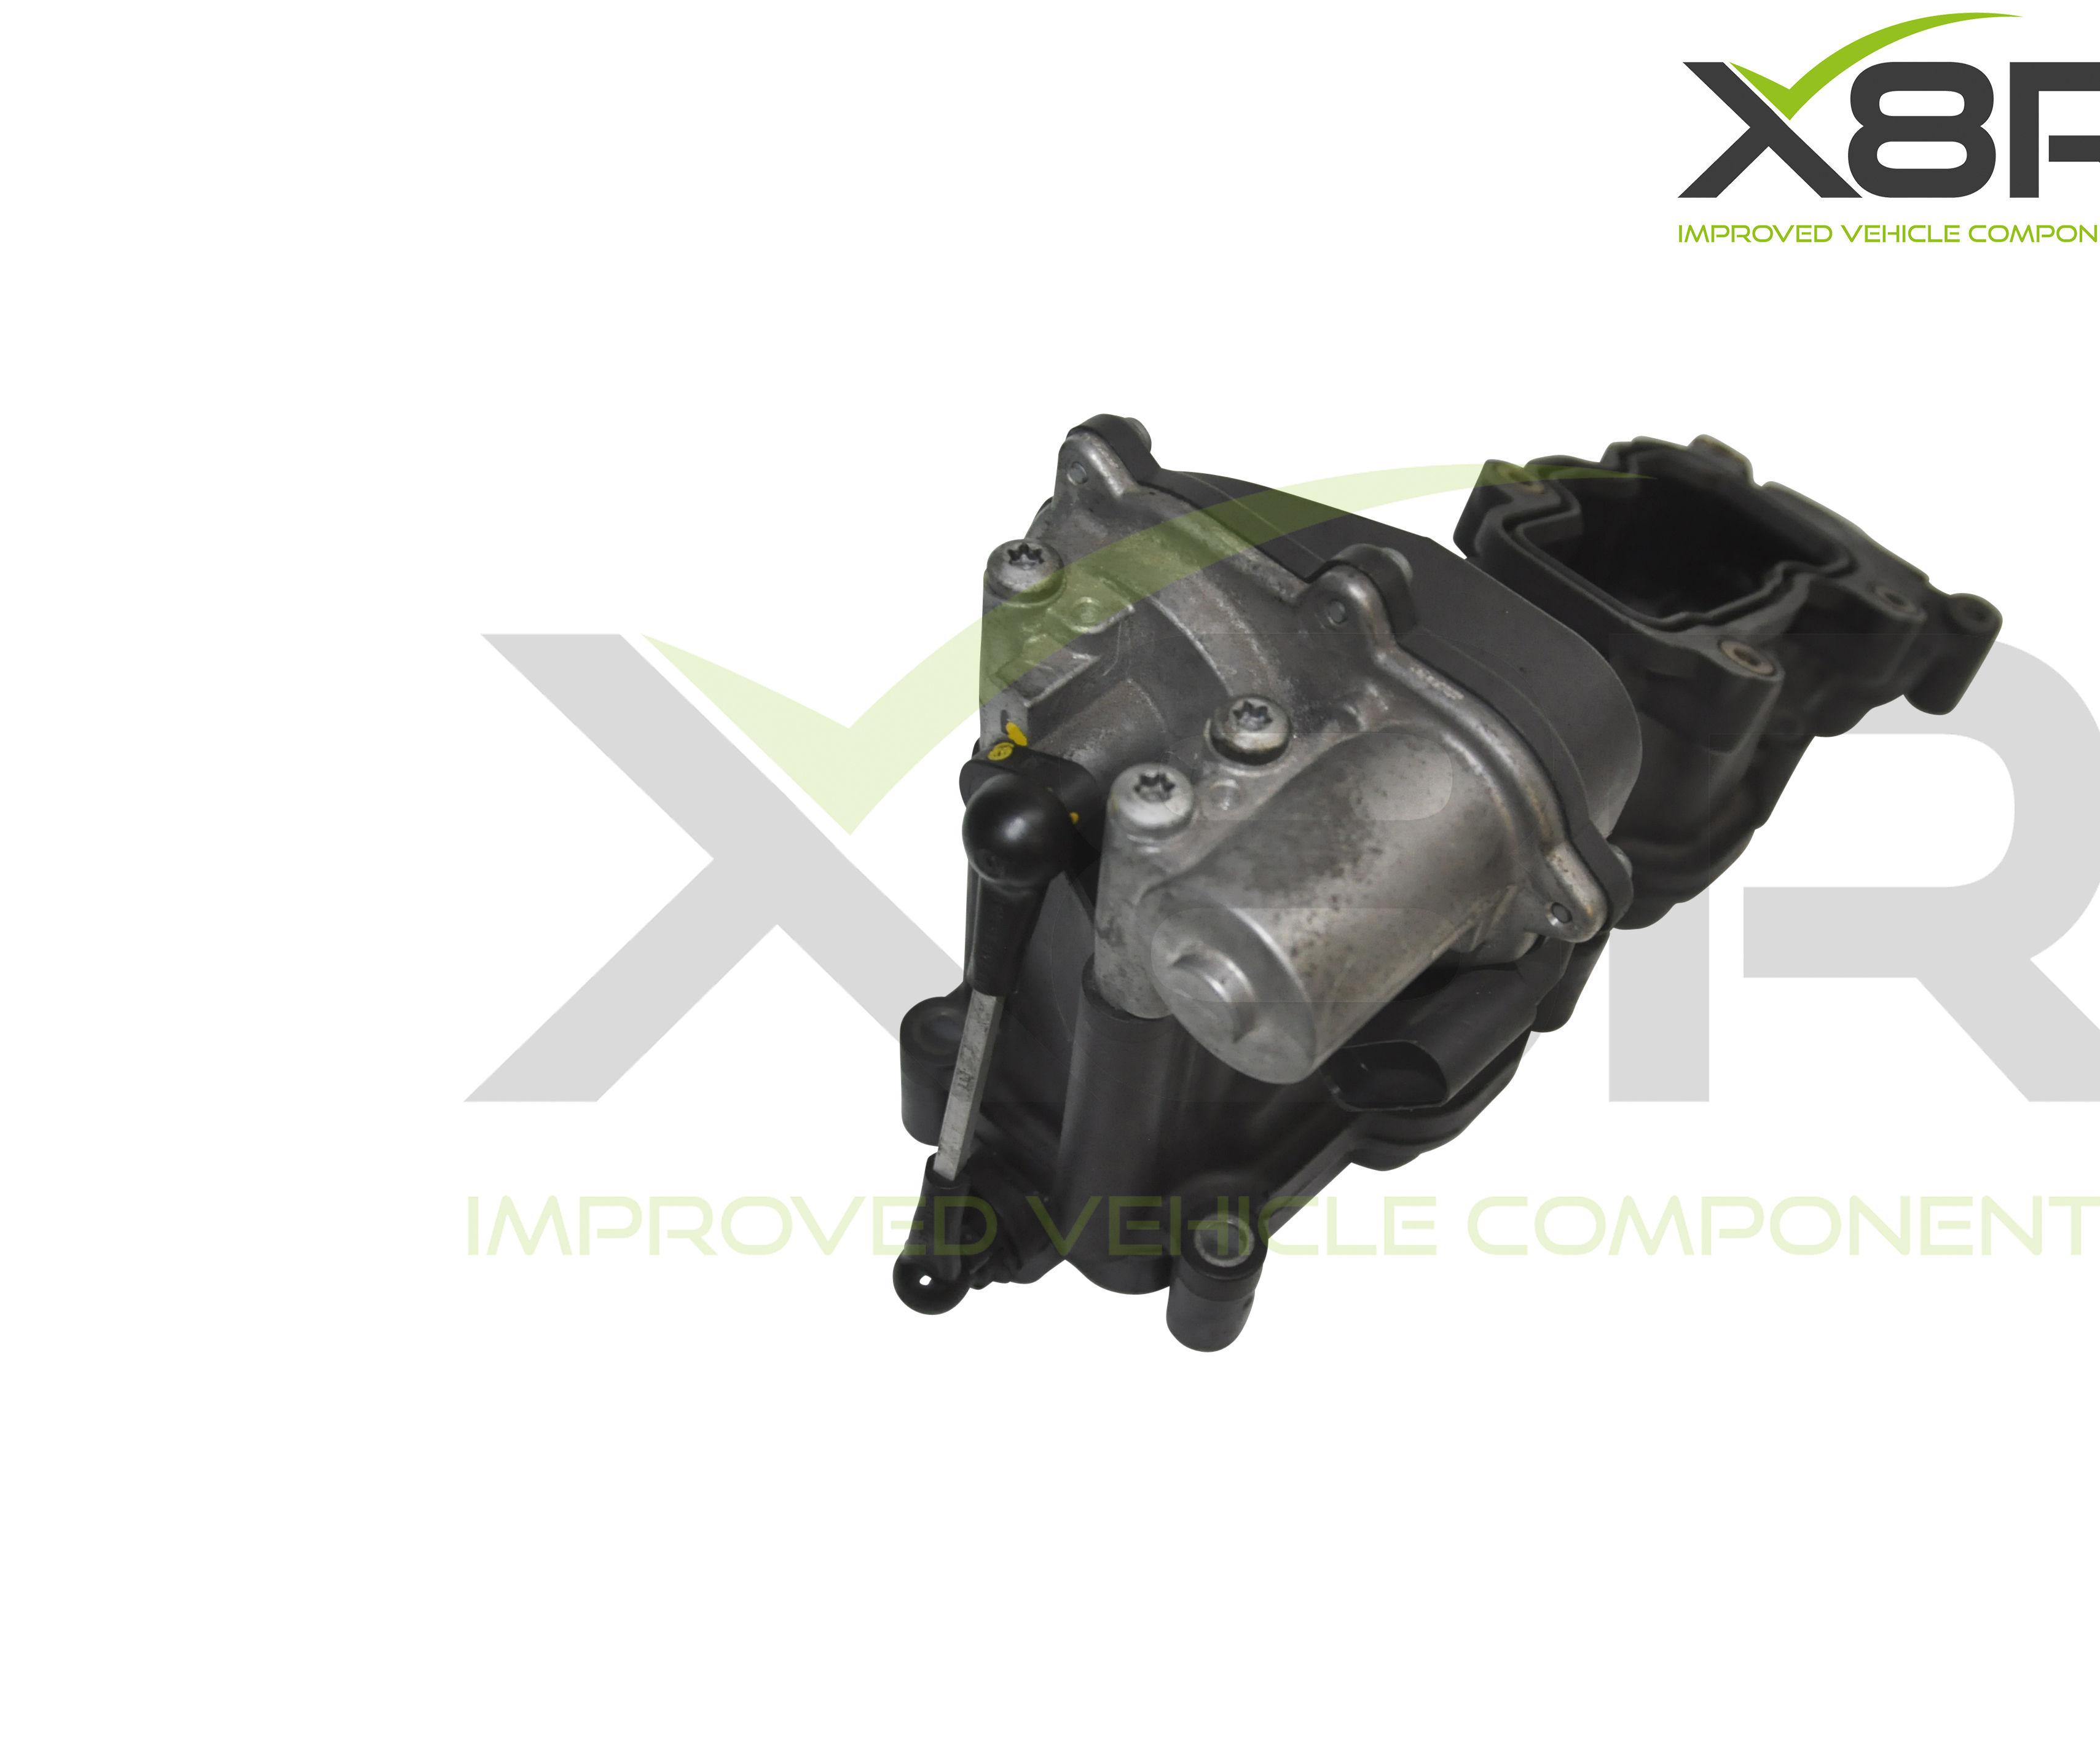 Audi Seat Skoda VW 2.7 & 3.0 TDI Left & Right Intake Inlet Intake Manifold P2015 Error Motor Actuator Repair Bracket Fix Kit Install Instructions Guide